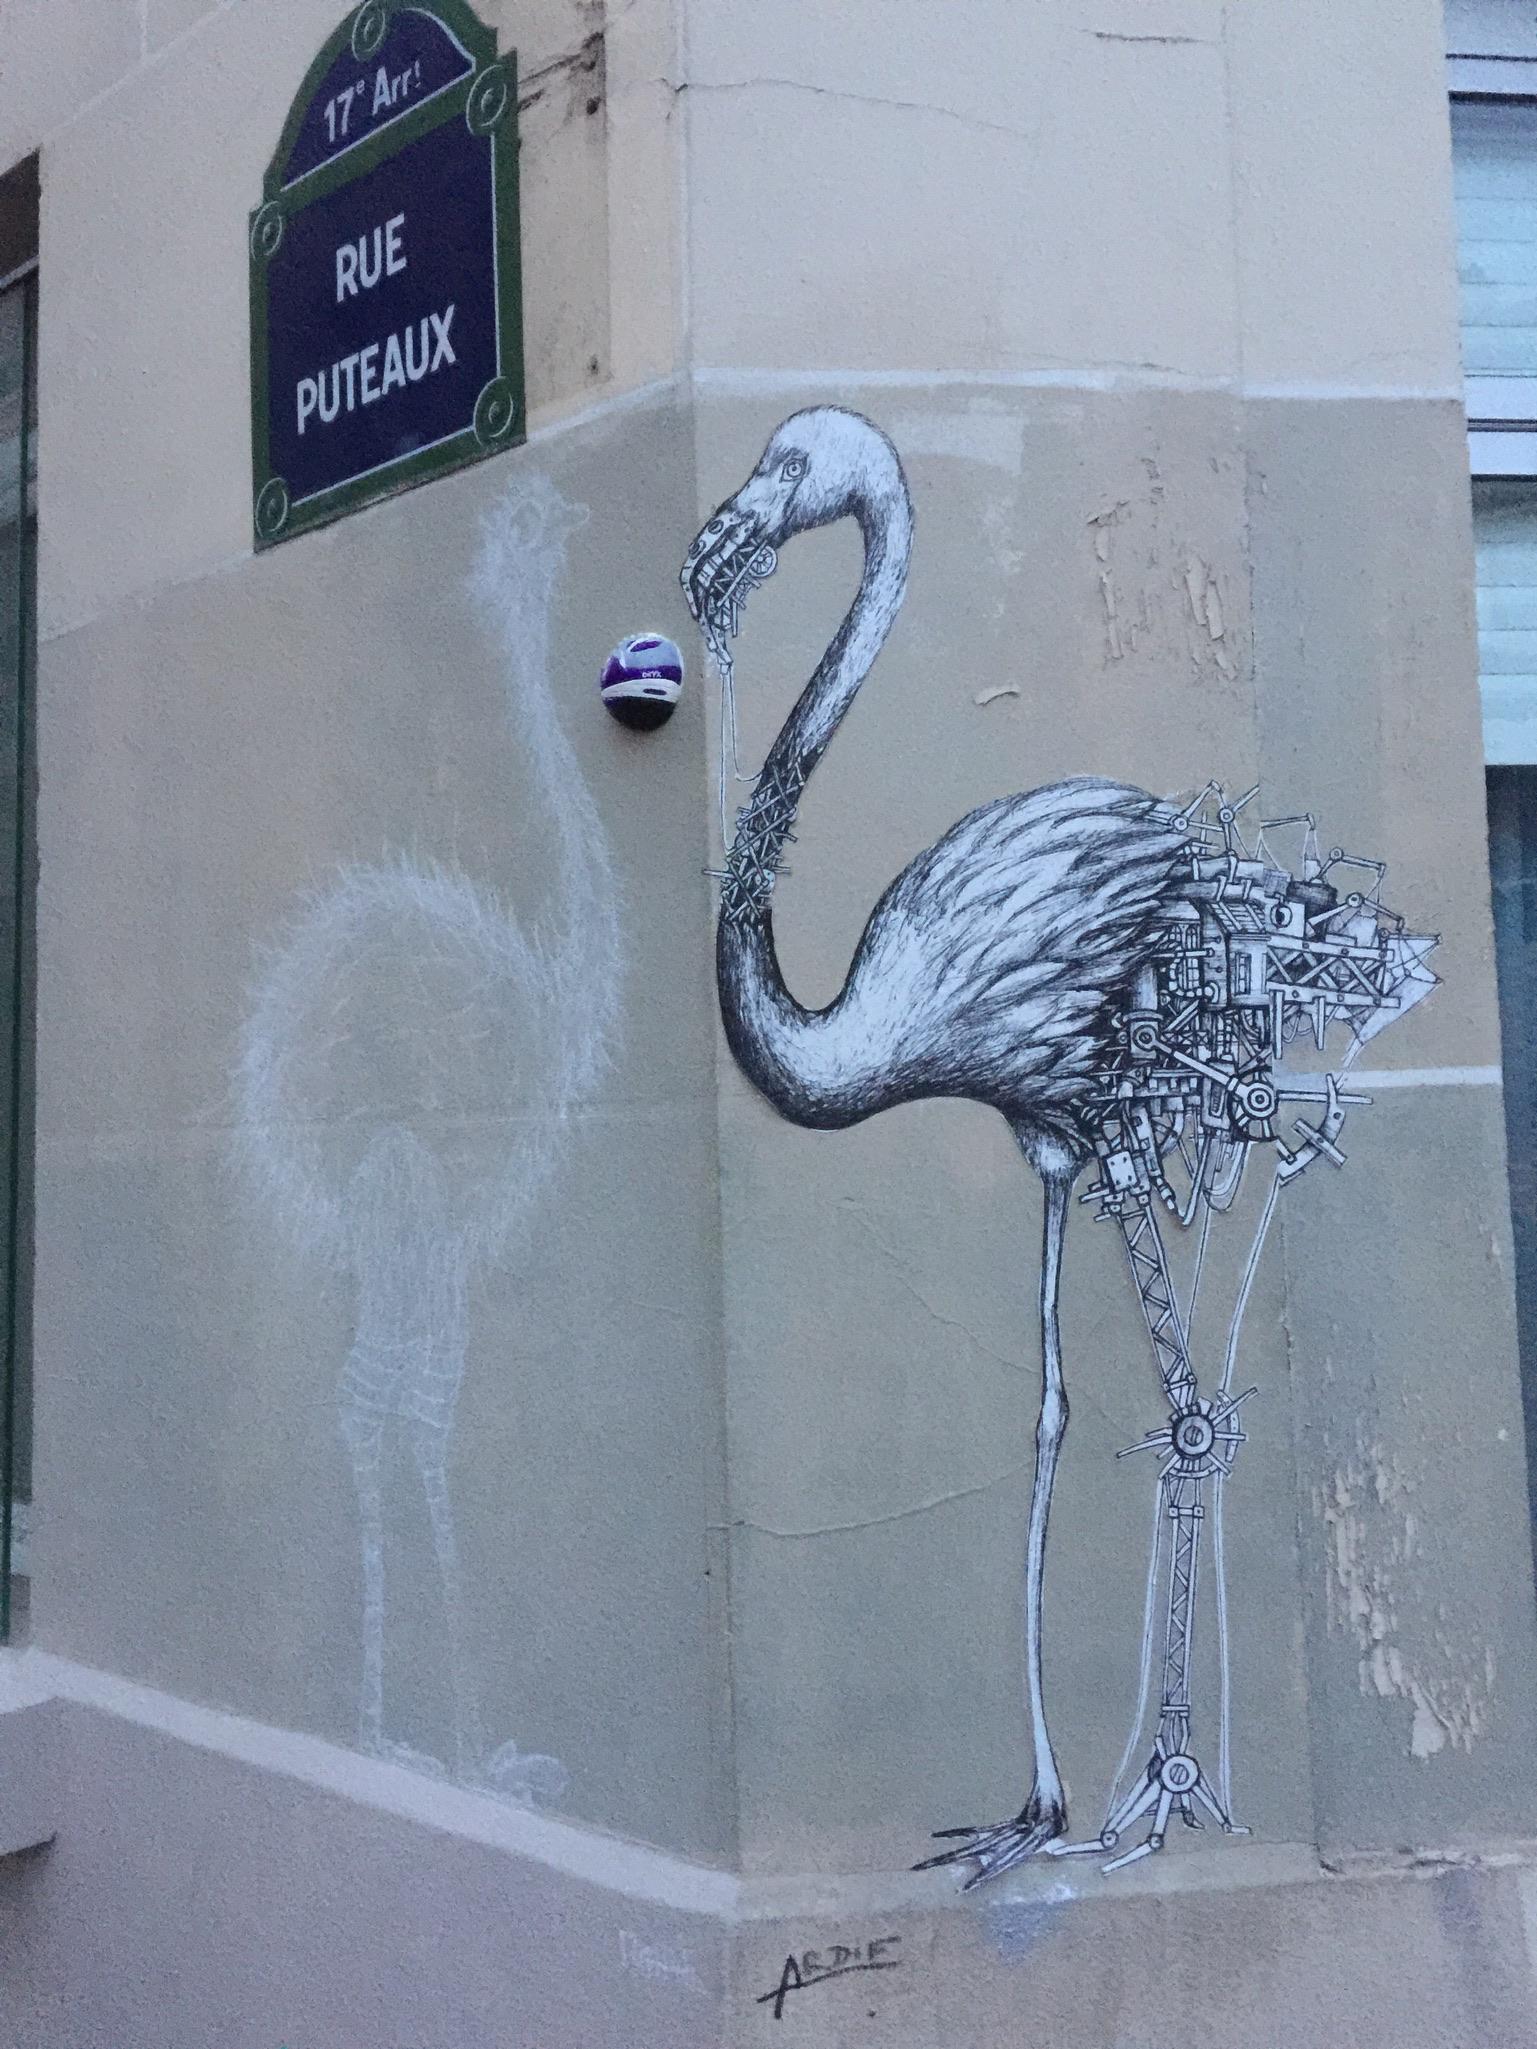 Street art in central Paris.